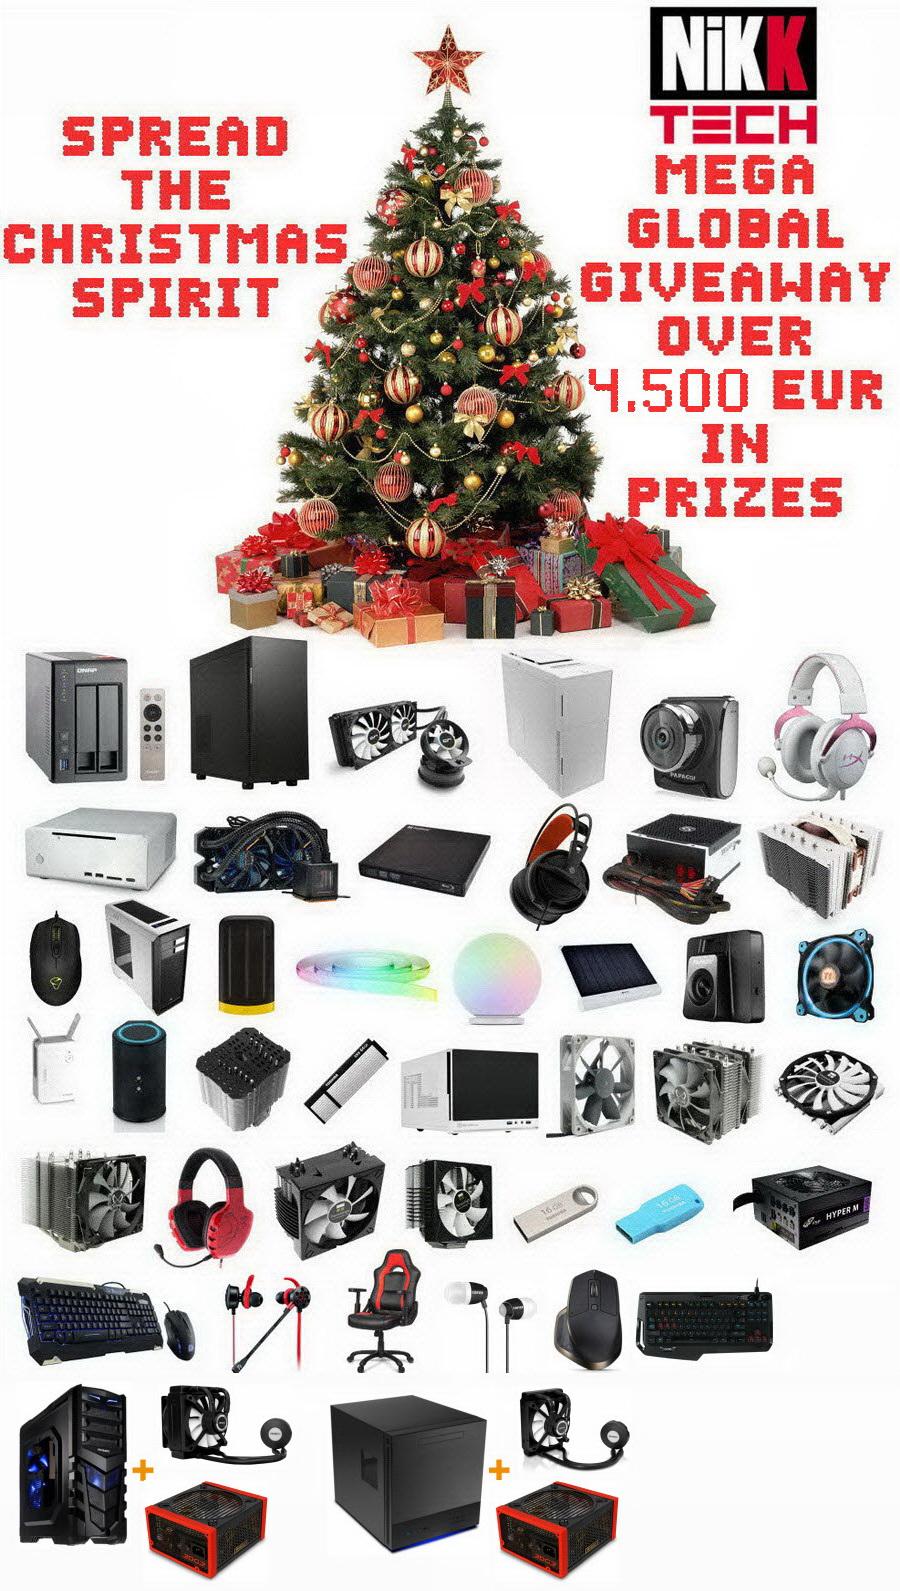 58 - Spread The Christmas Spirit Mega Global Giveaway - Over